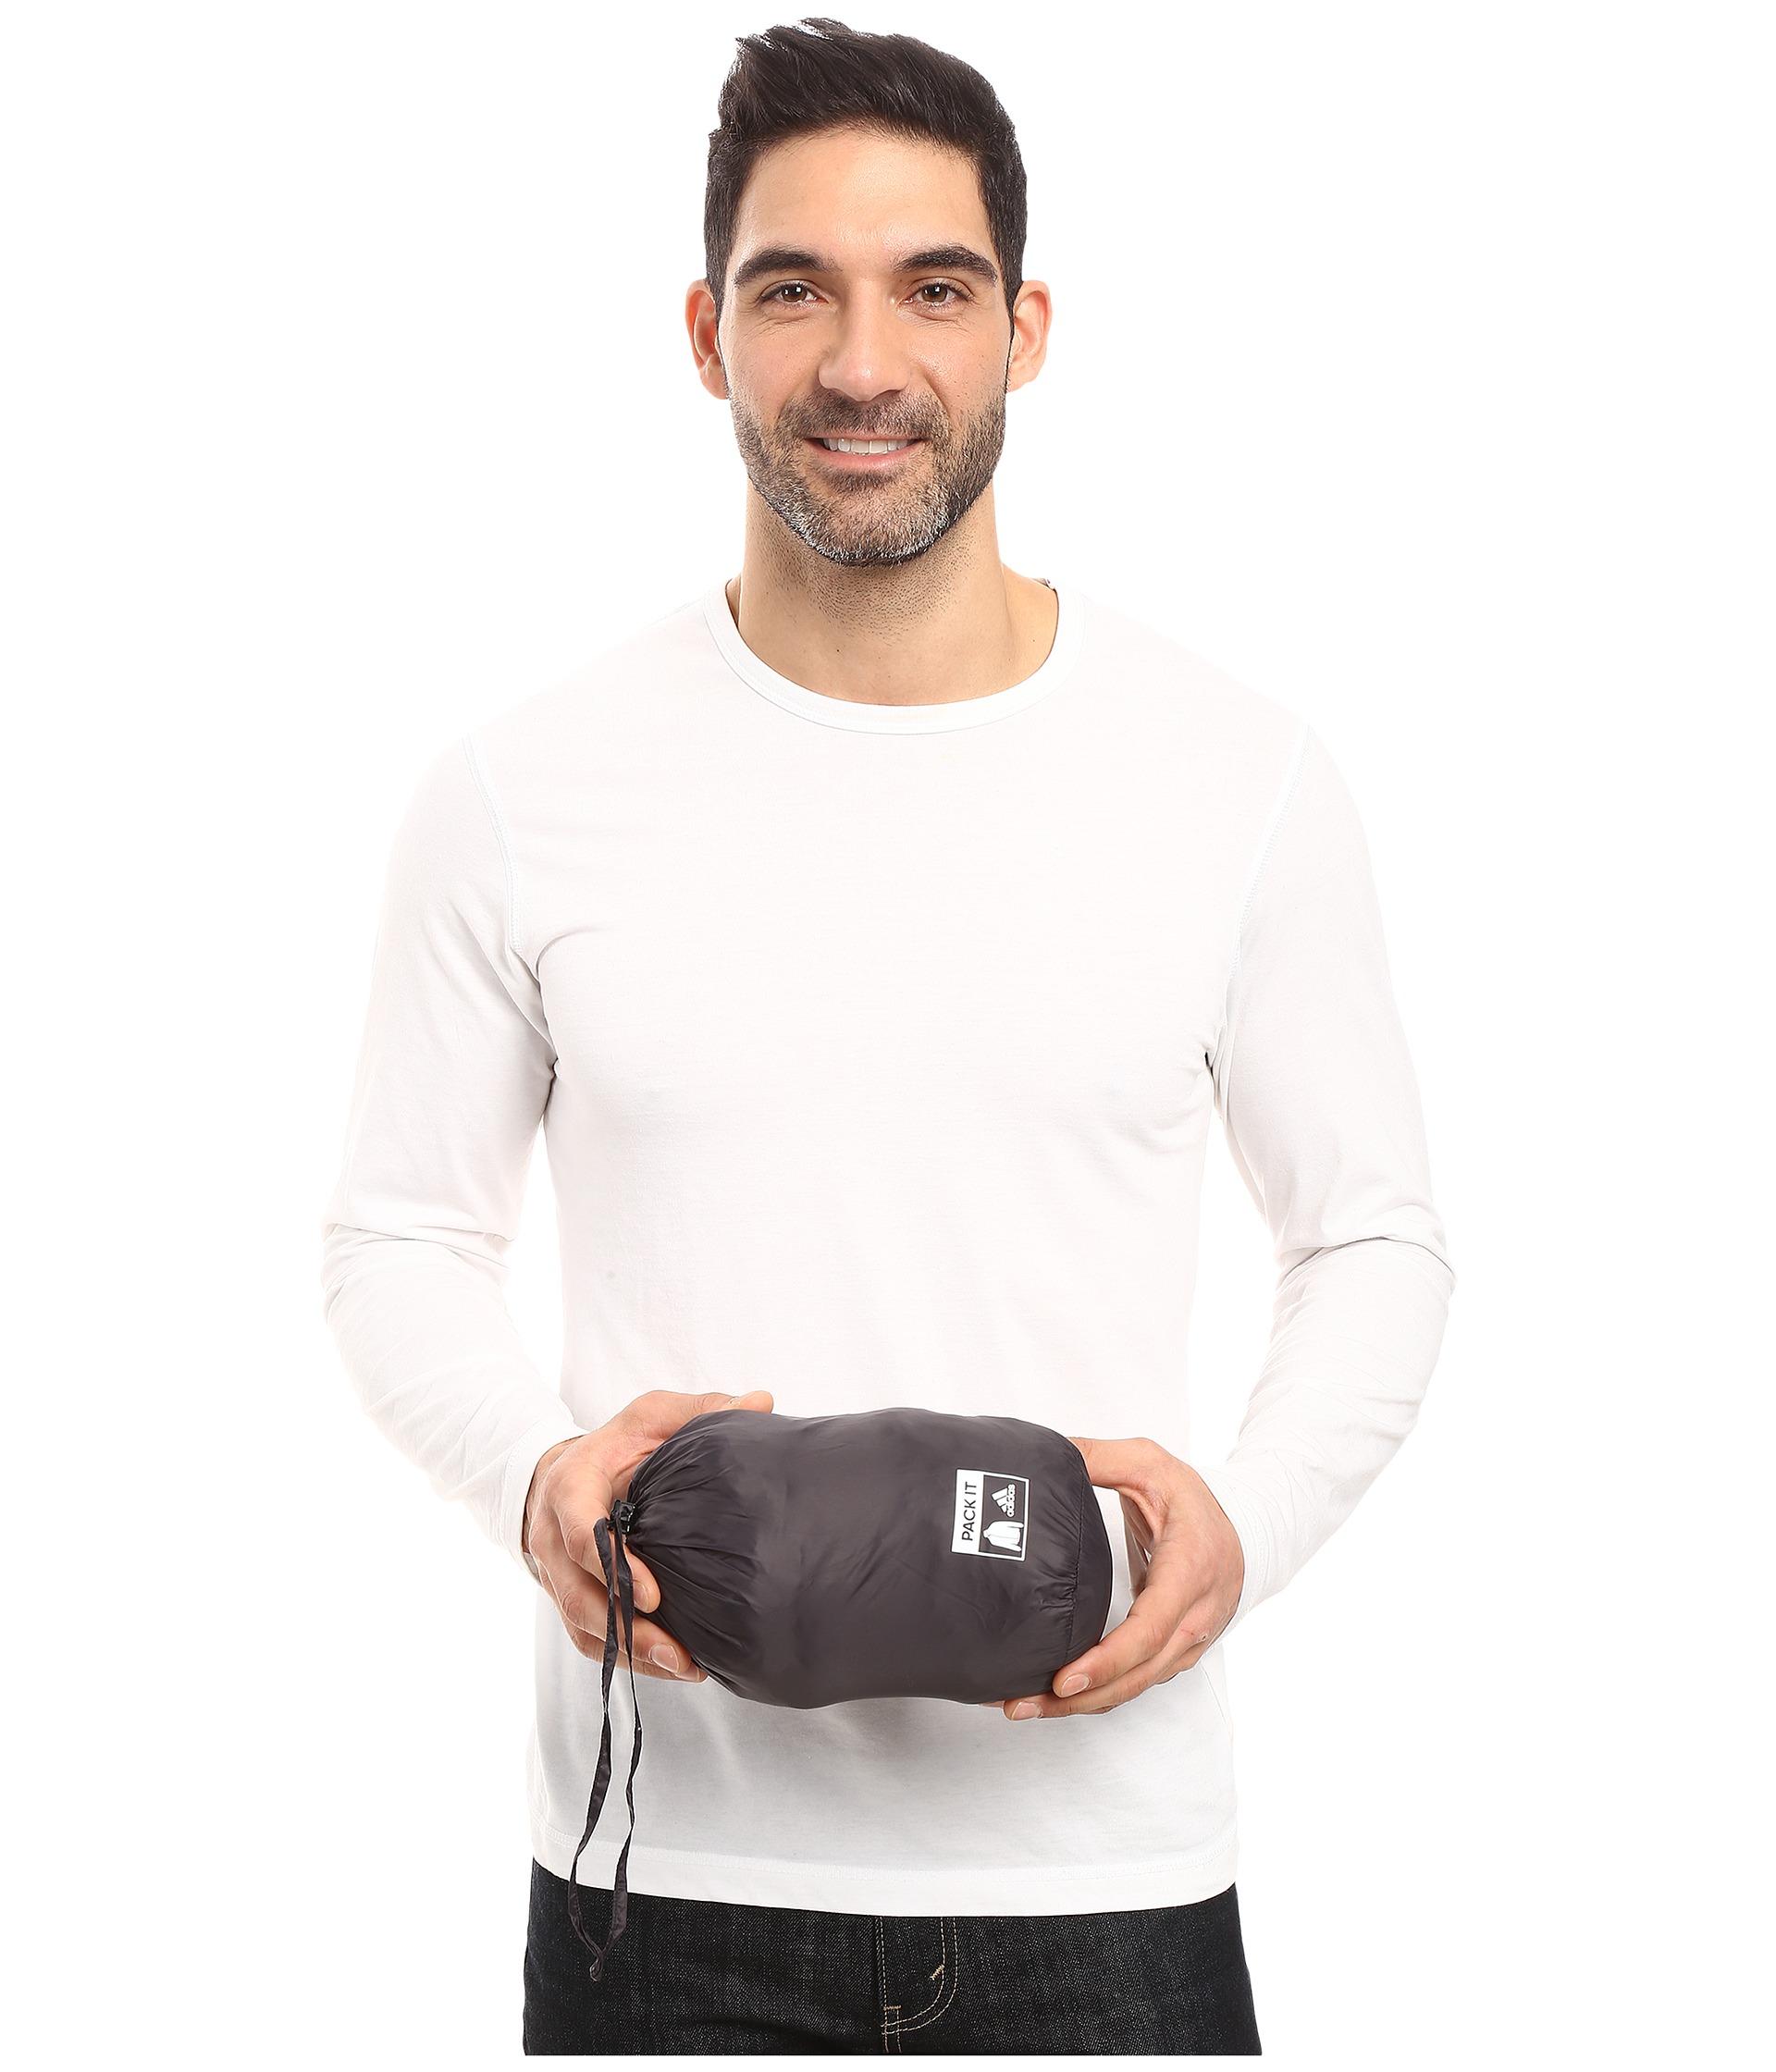 Down jacket utility black black zappos com free shipping both ways